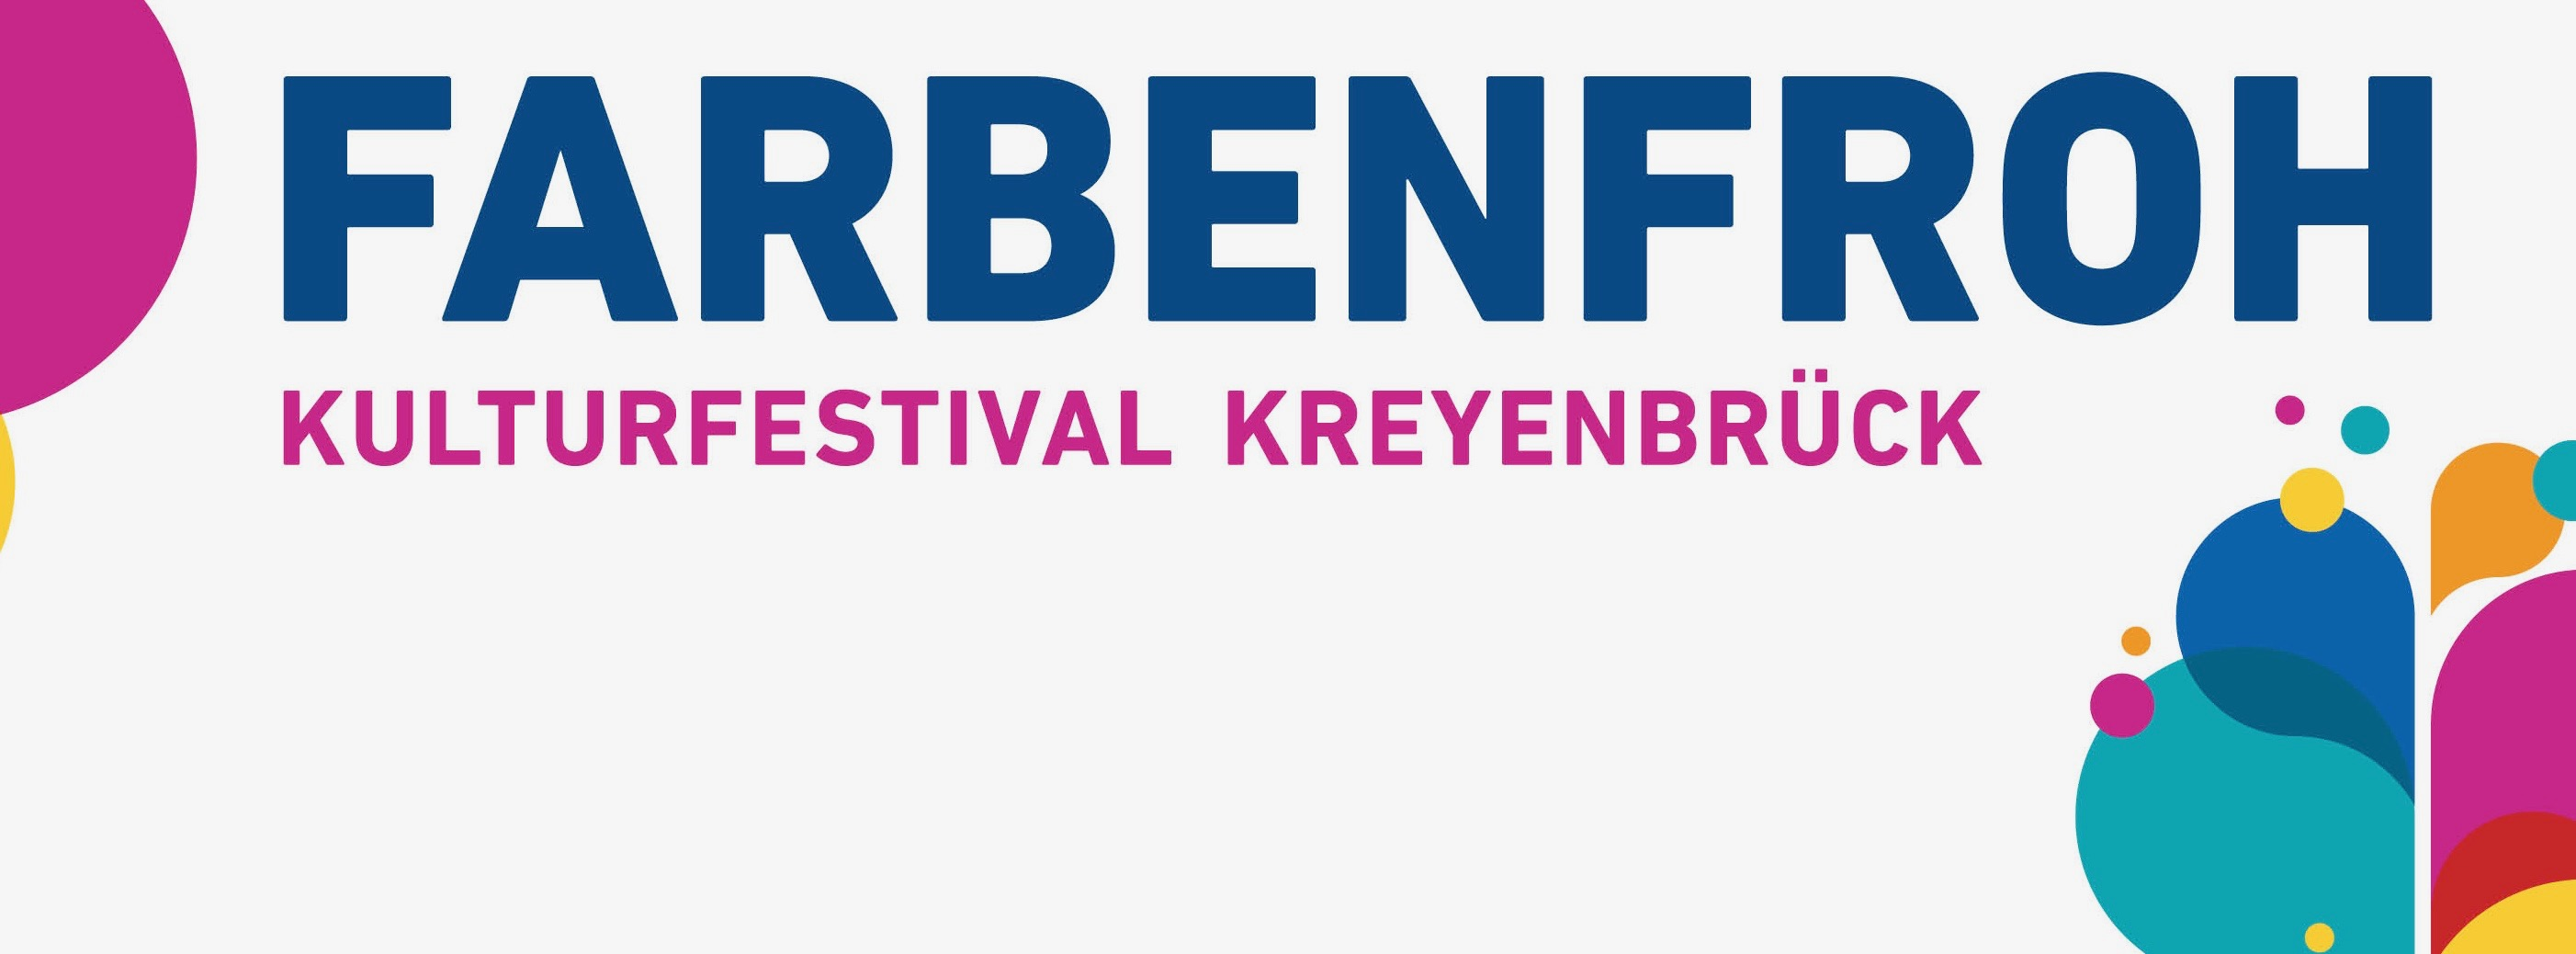 FARBENFROH / Kulturfestival Kreyenbrück  Logo